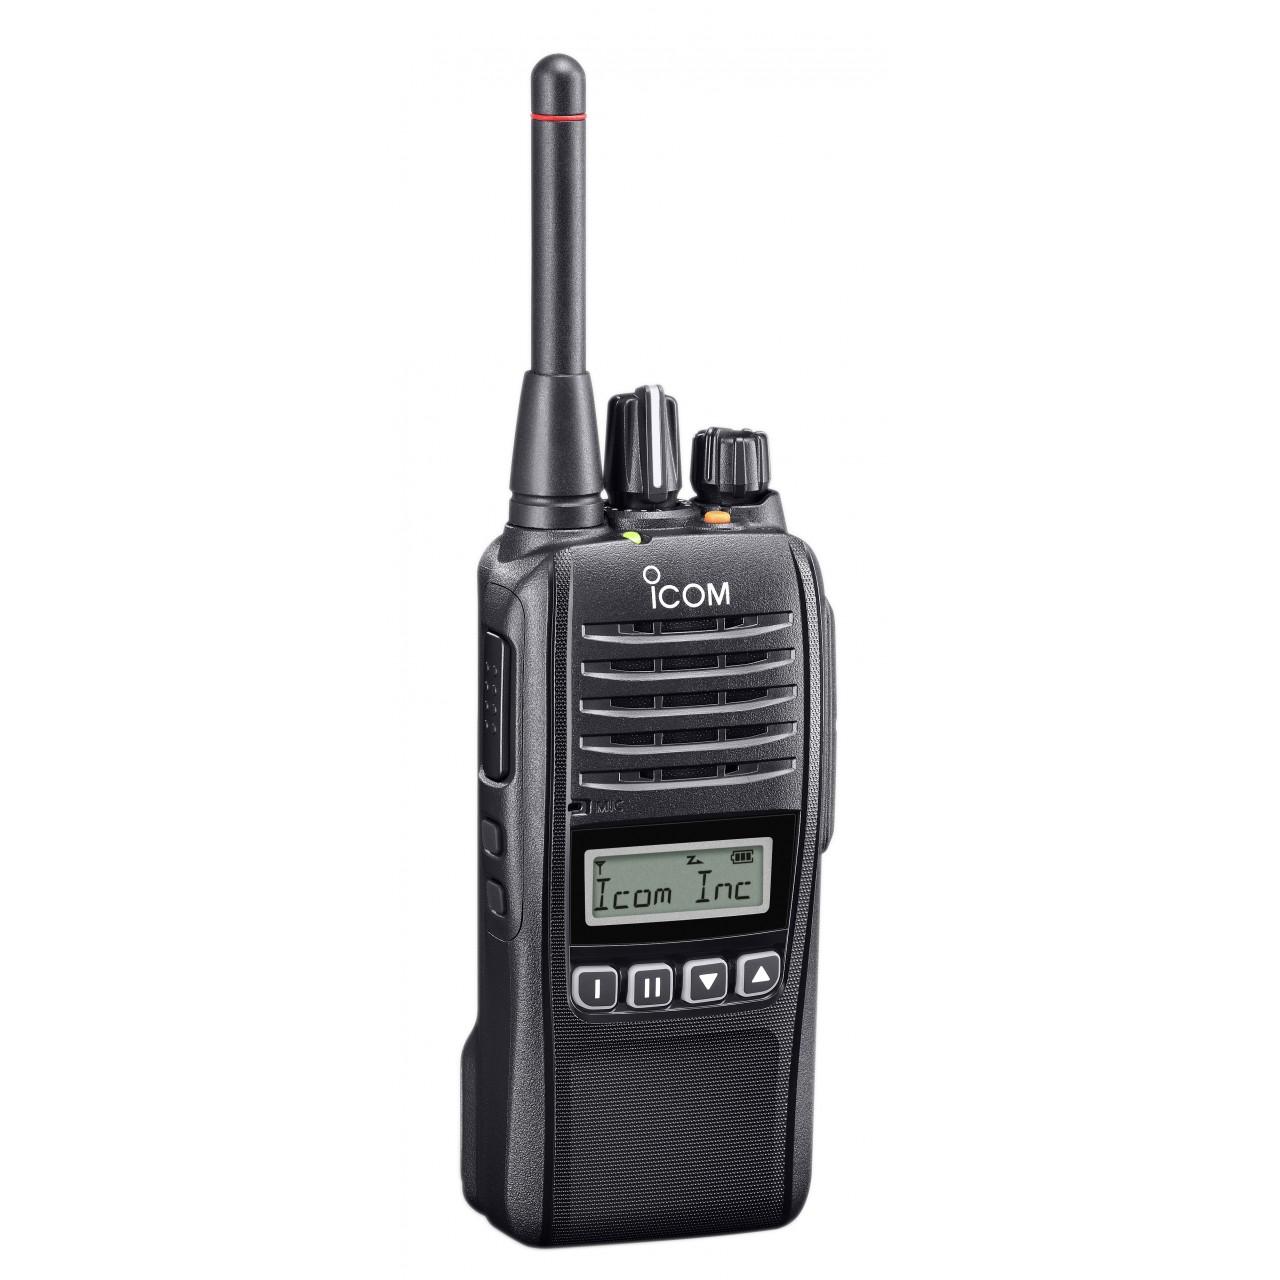 IC-F29SDR Handhelds - ICOM